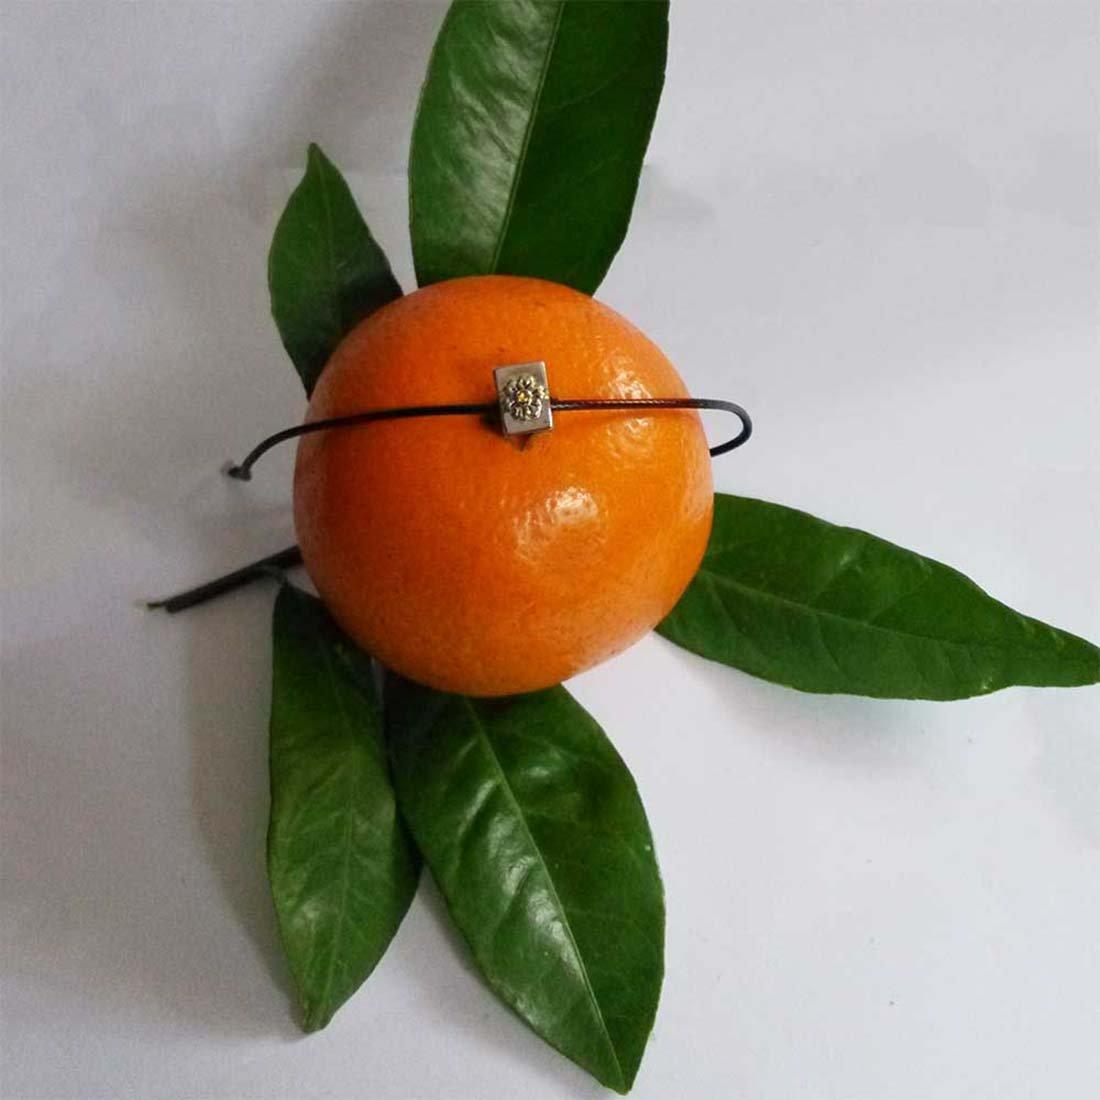 GiftJewelryShop Silver Plated Kiss Me Im Irish Topaz Crystal November Birthstone Flower Bead Charm Bracelets